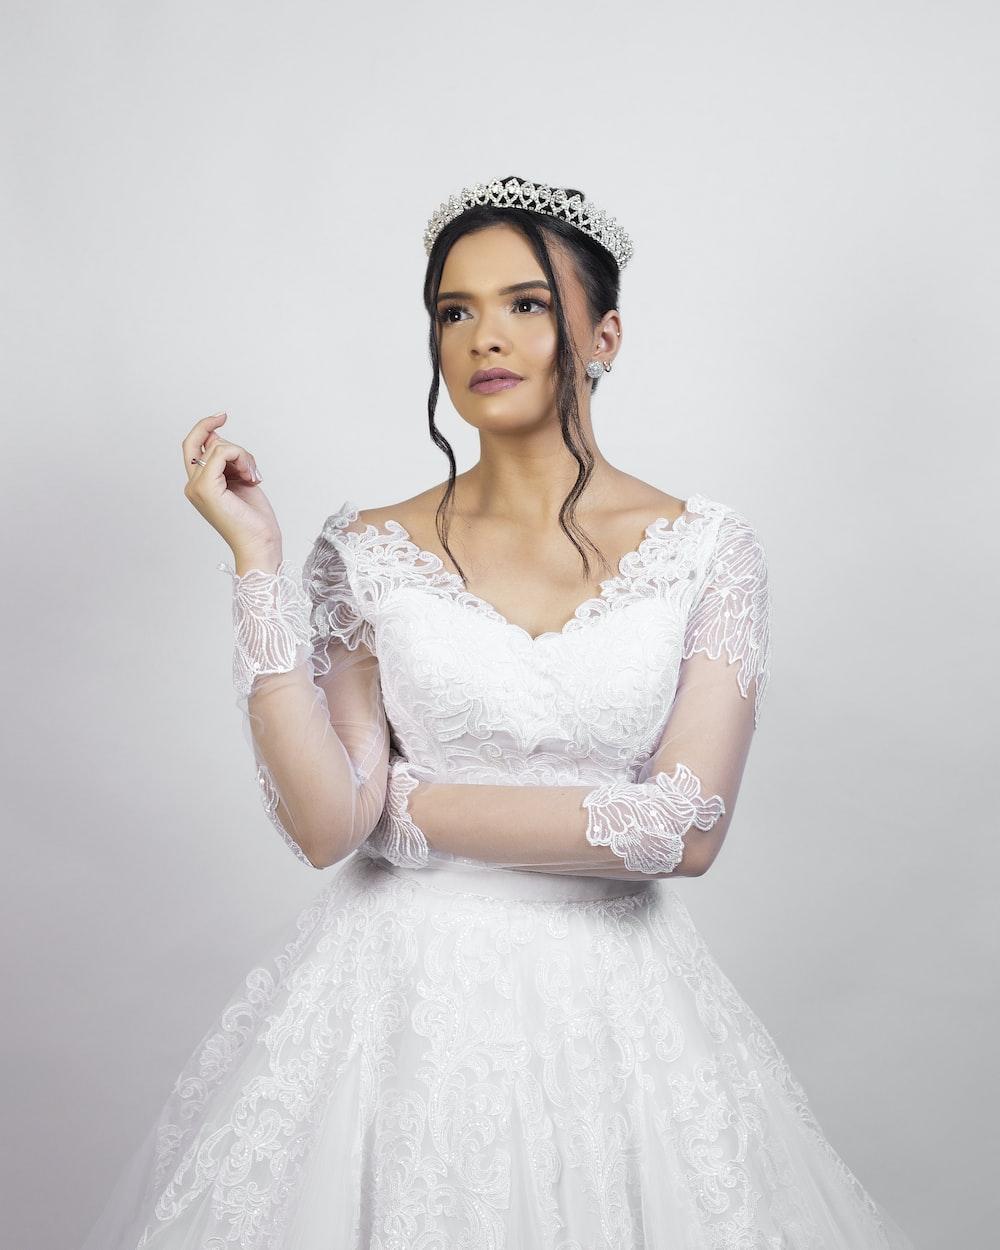 woman in white floral dress wearing white floral tiara